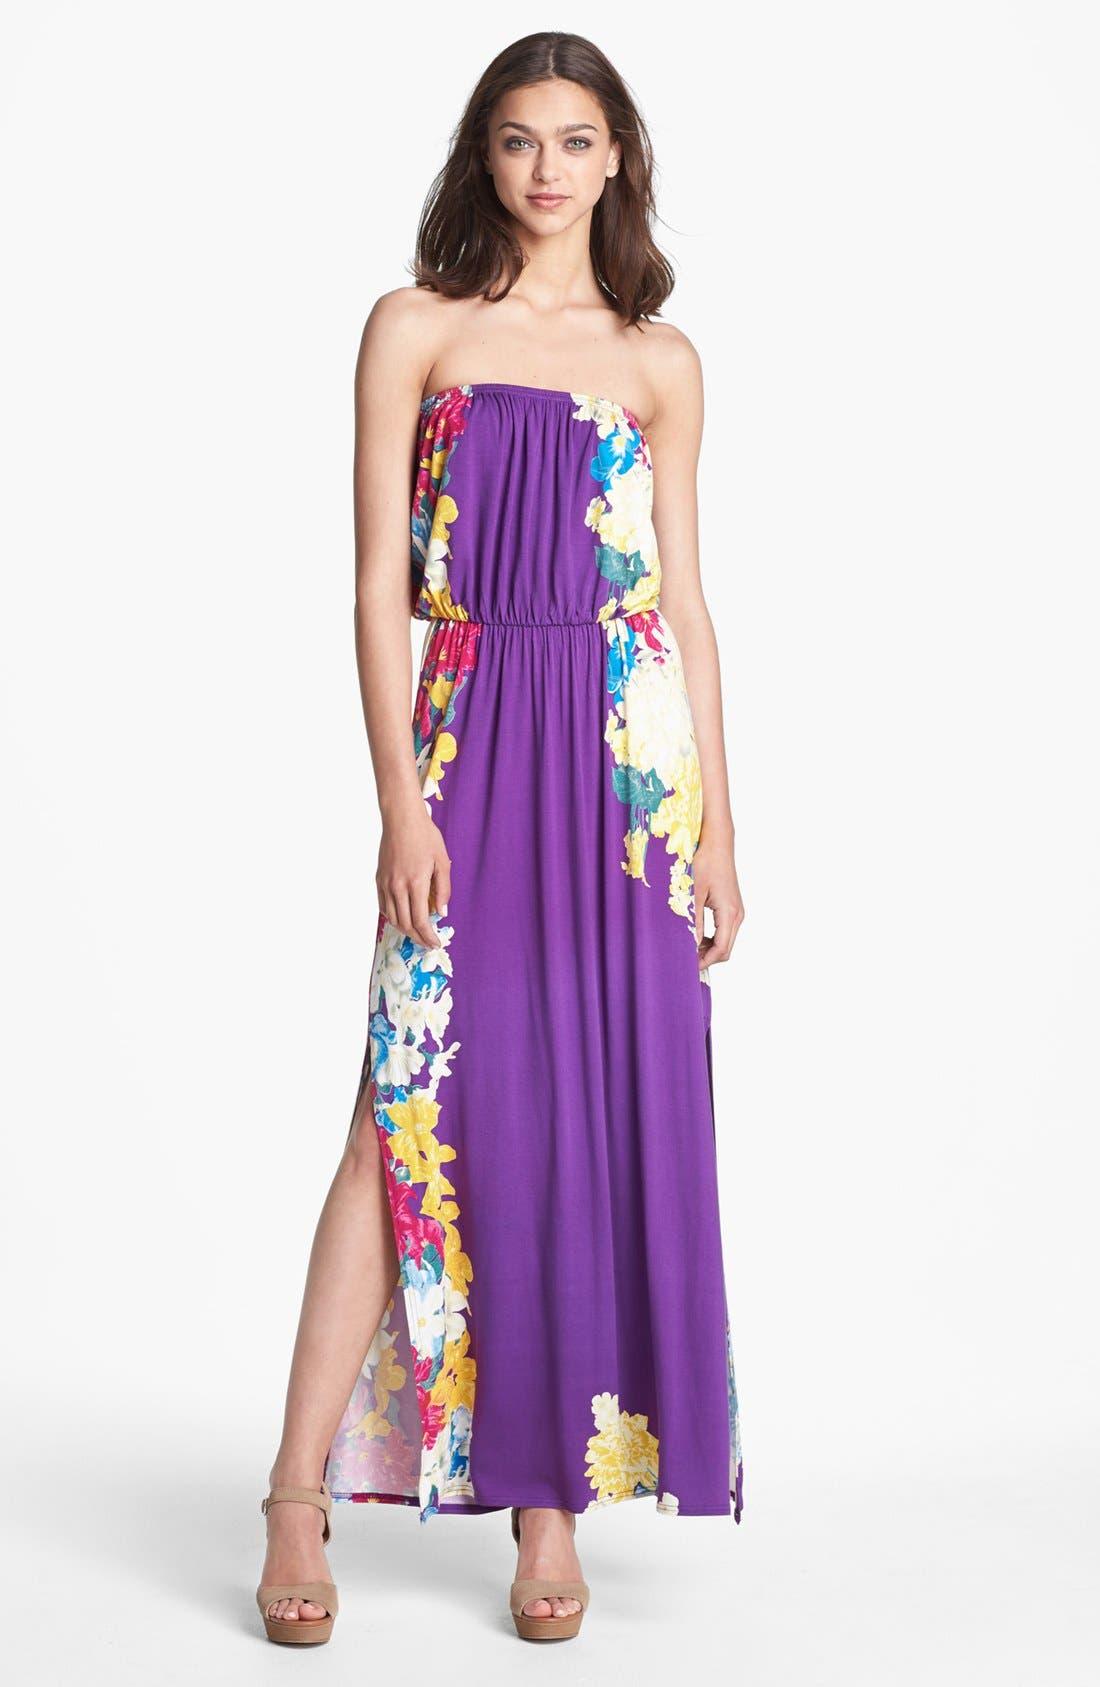 Alternate Image 1 Selected - Felicity & Coco Print Jersey Maxi Dress (Regular & Petite) (Nordstrom Exclusive)